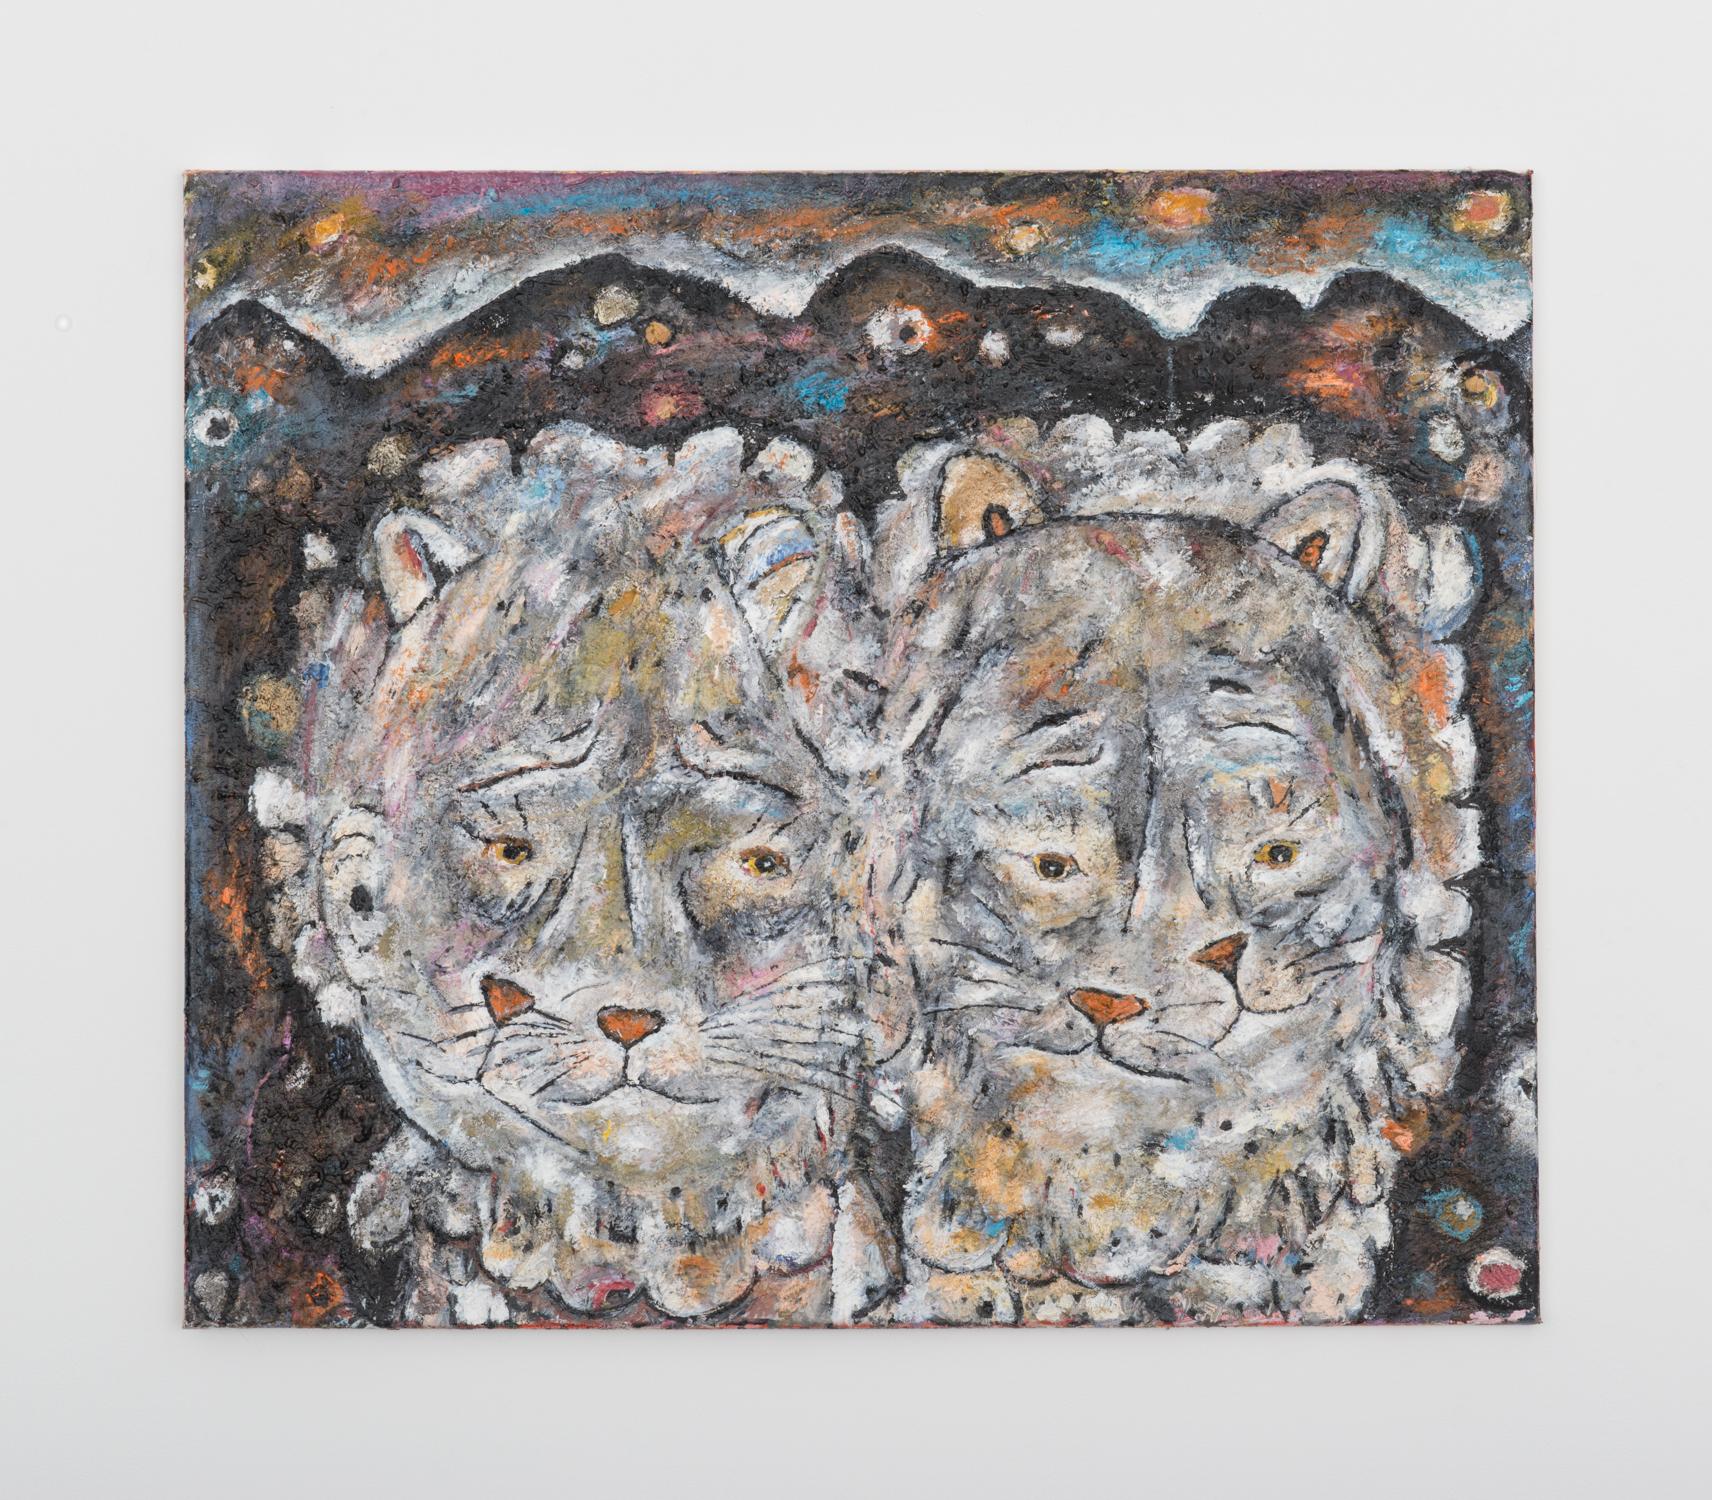 Ellen Gronemeyer  Step Brothers  2016 Oil on canvas 23 ⅔h x 27 ½w in EG010